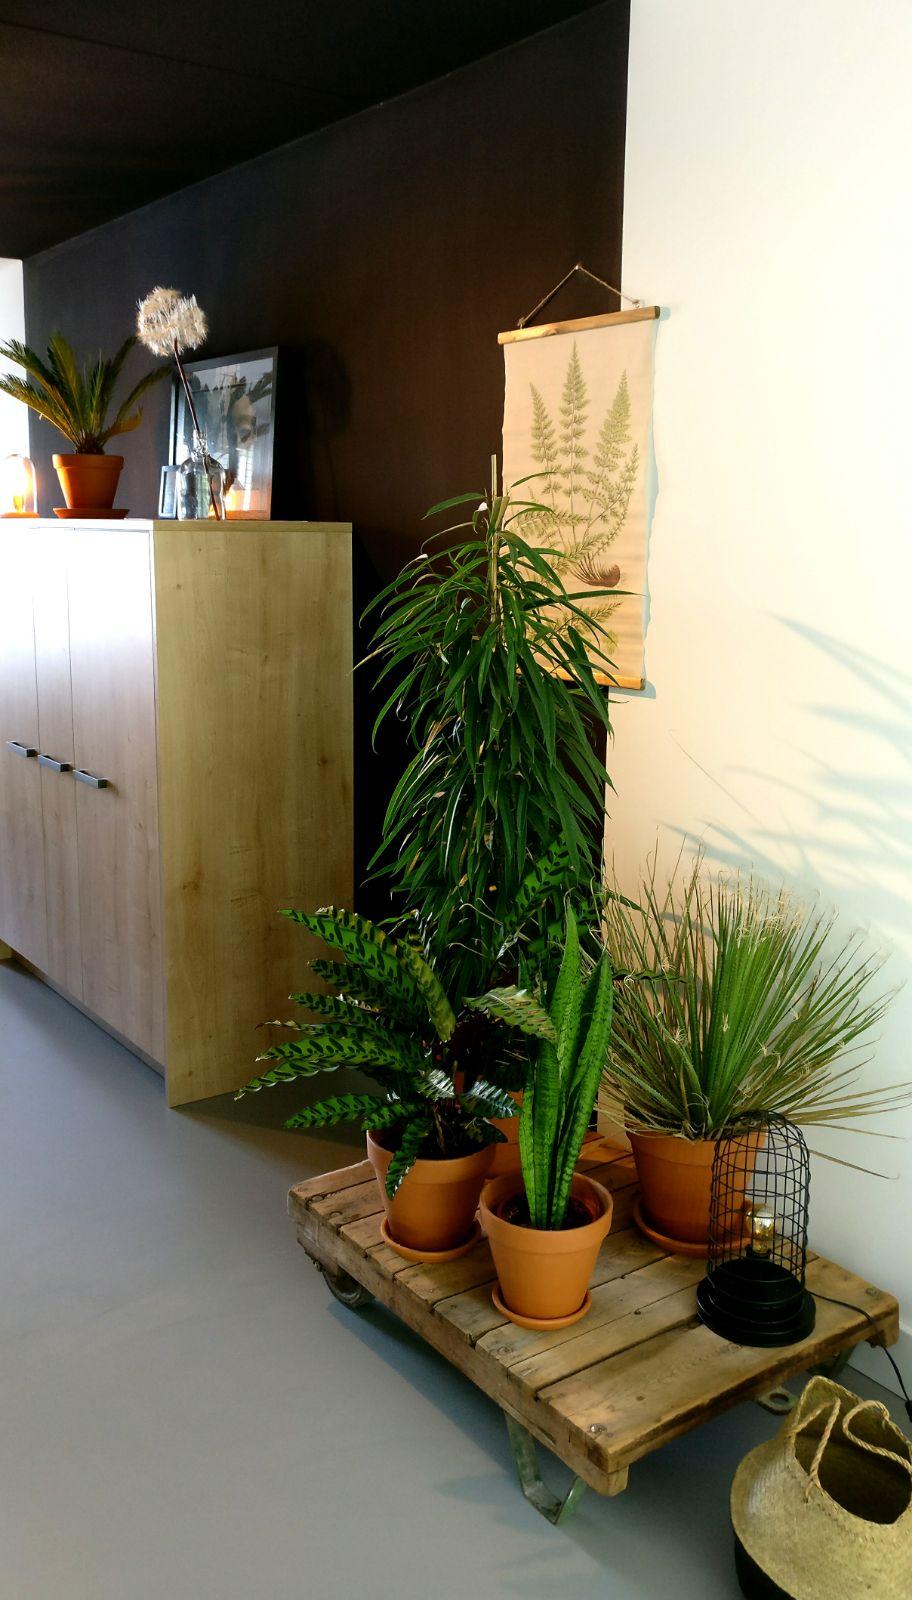 appartement nieuwbouw industrieel stoer zwarte keuken eiken keuken planten trolley urban jungle.jpg